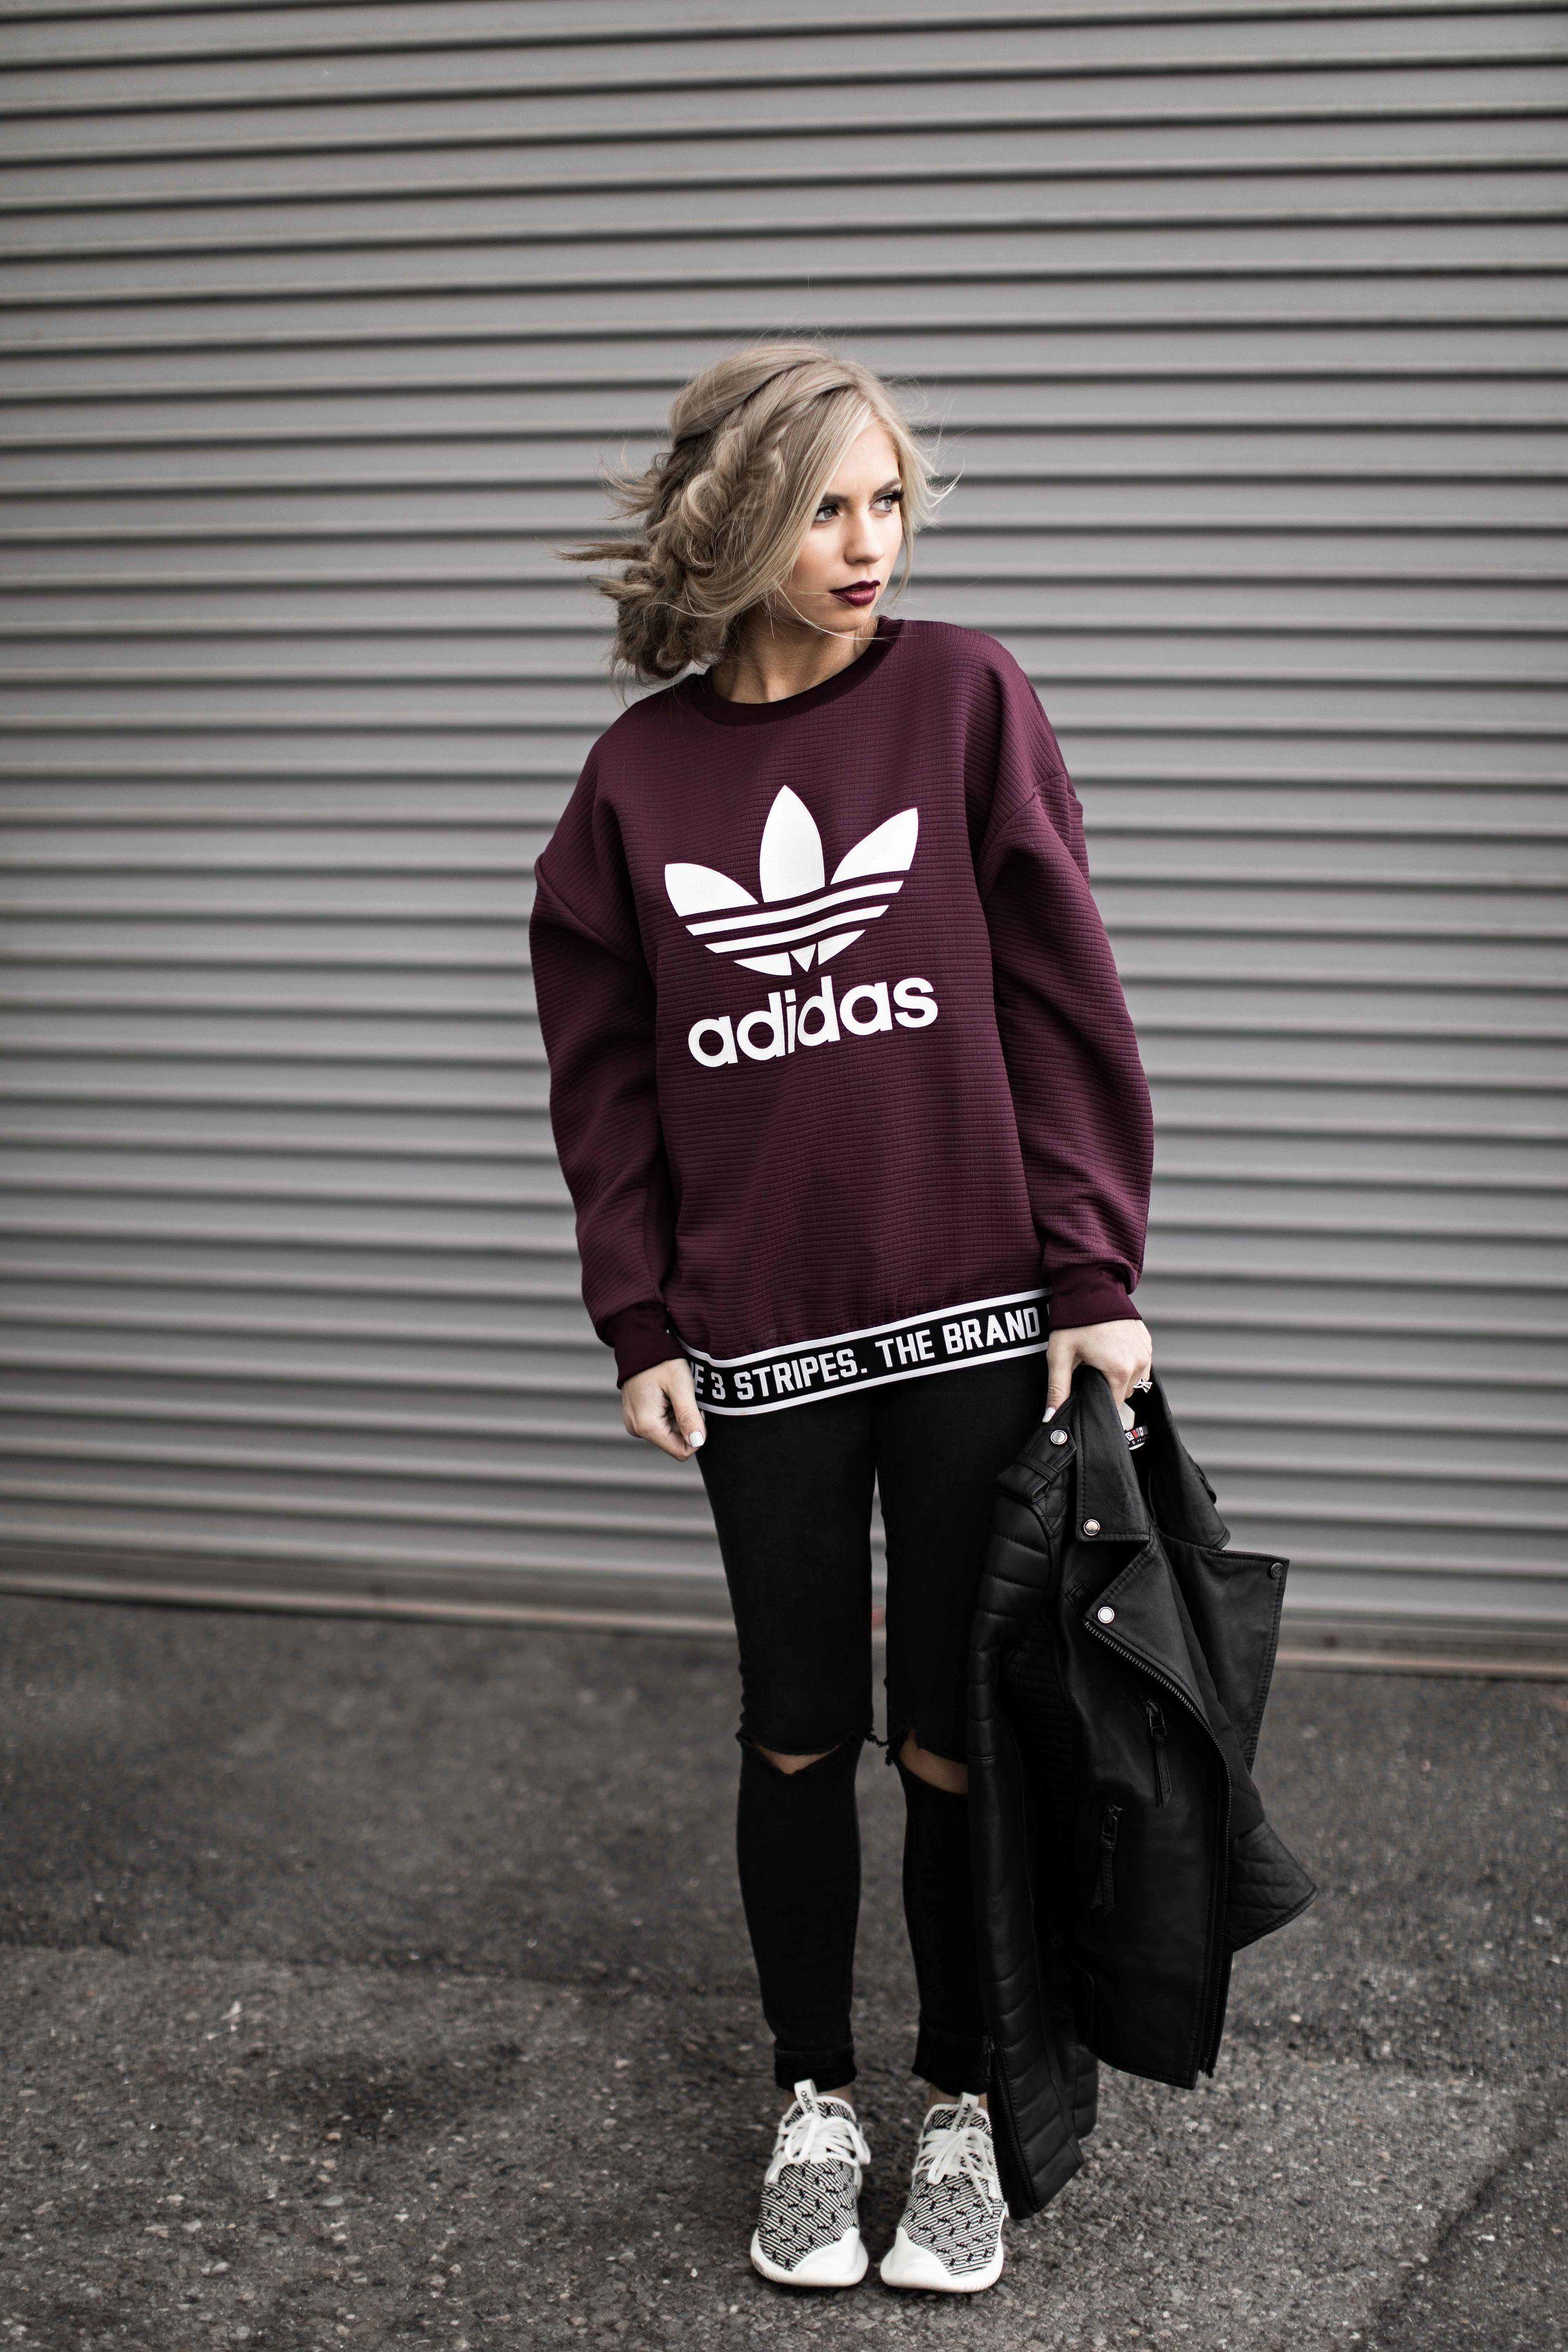 3 stripes | Adidas outfit, Fashion, Adidas women